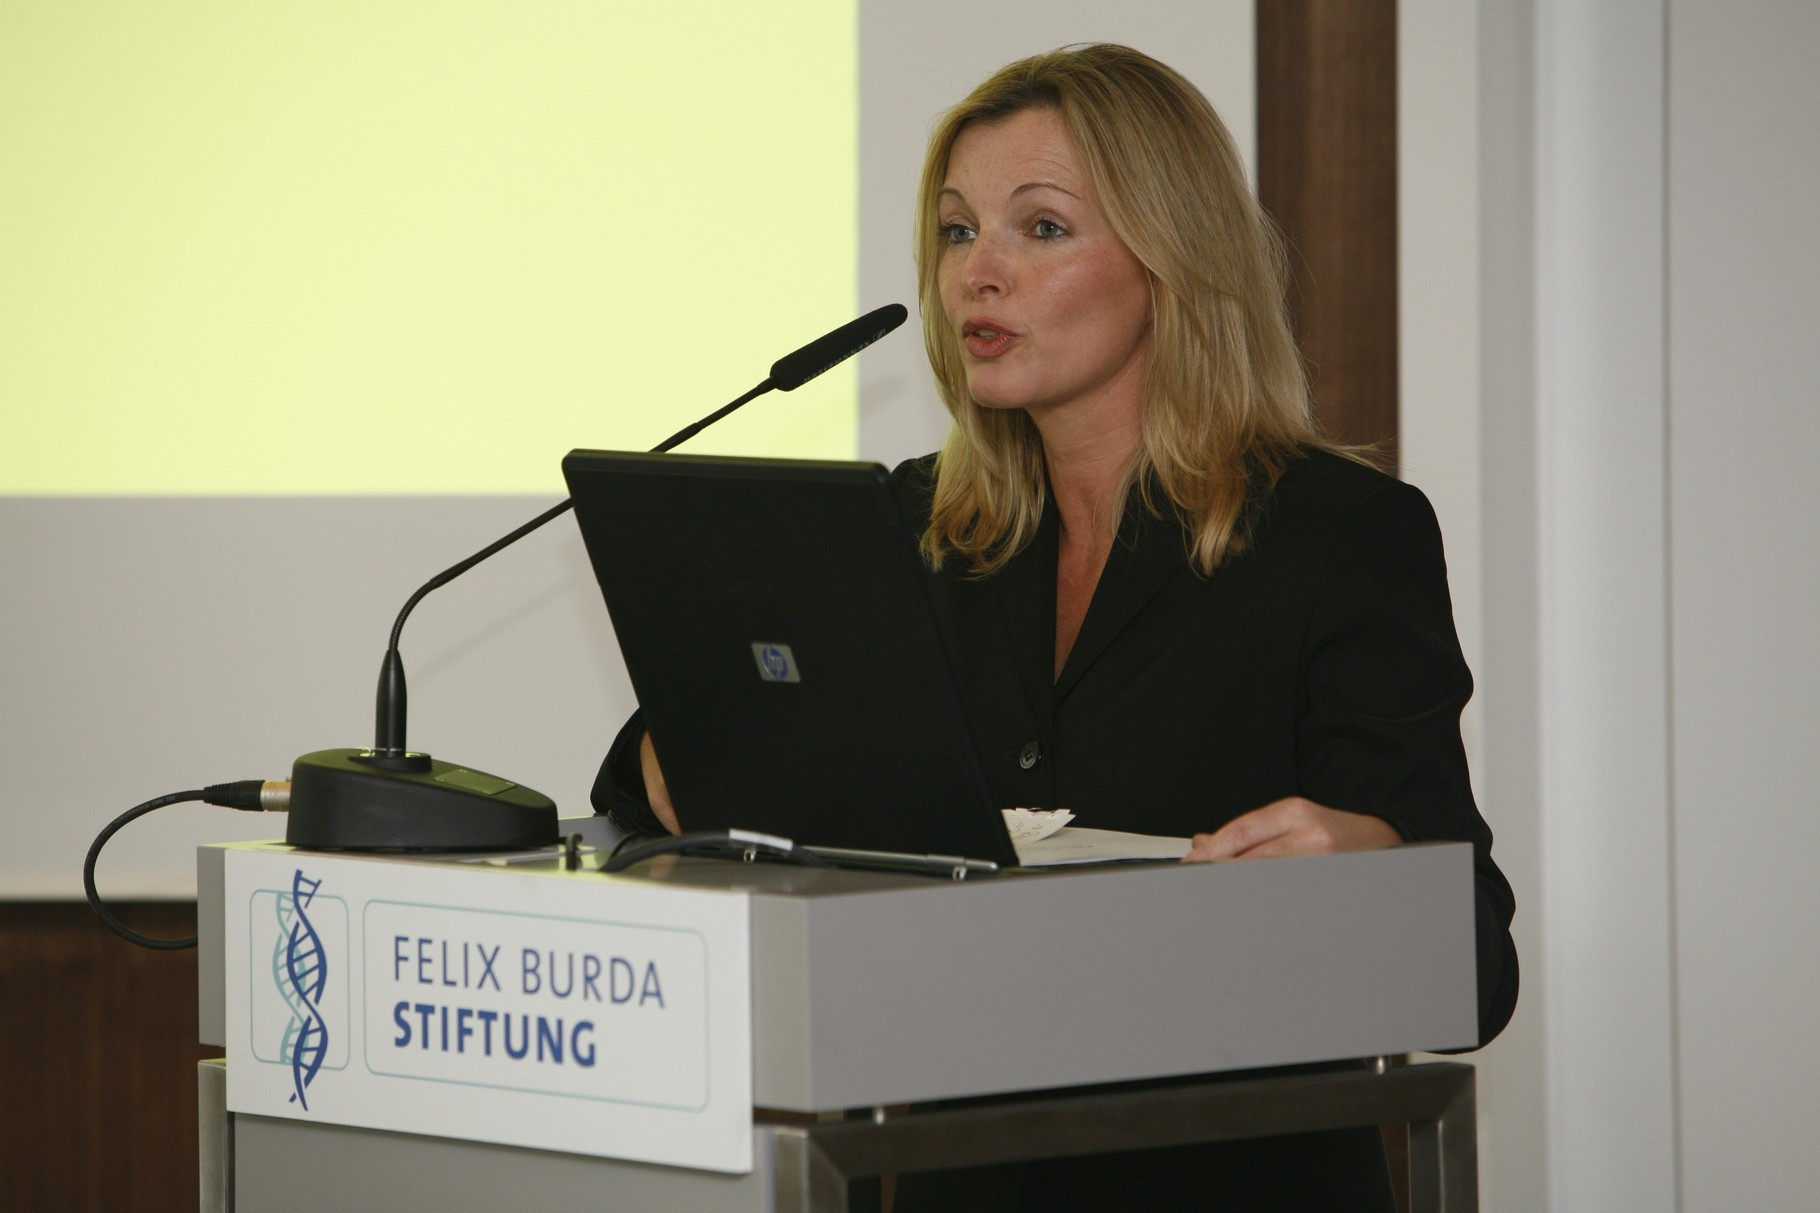 Pressekonfernz der Felix Burda Stiftung